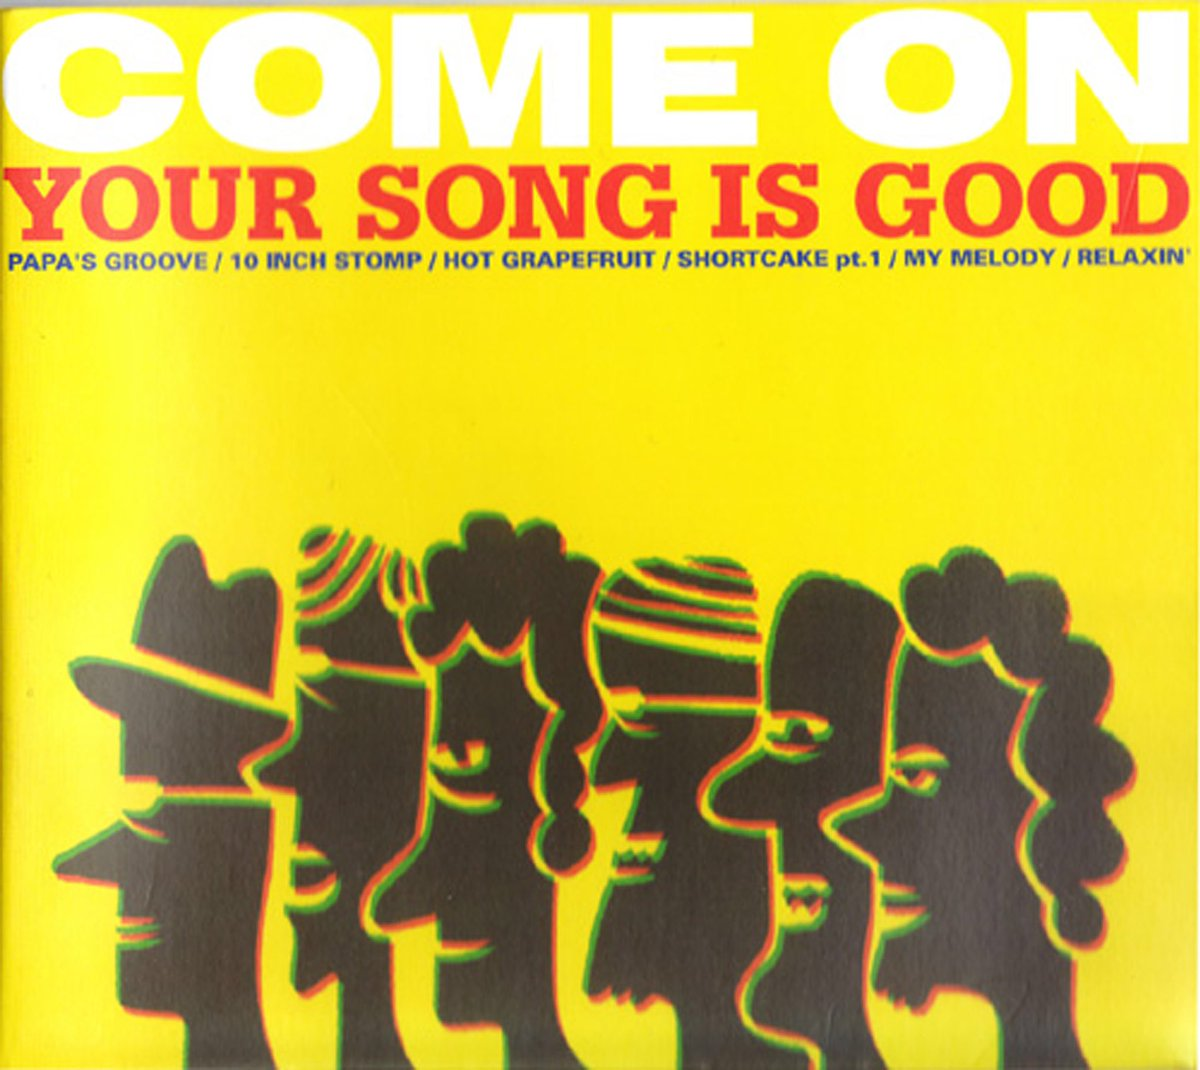 YSIG初のCD作品でもあるEP「COME ON」(2002)が本日よりDL・ストリーミング配信開始となりました!是非チェックしてみて下さい🌴🤙⛱🏄♂️😎Apple MusicSpotify